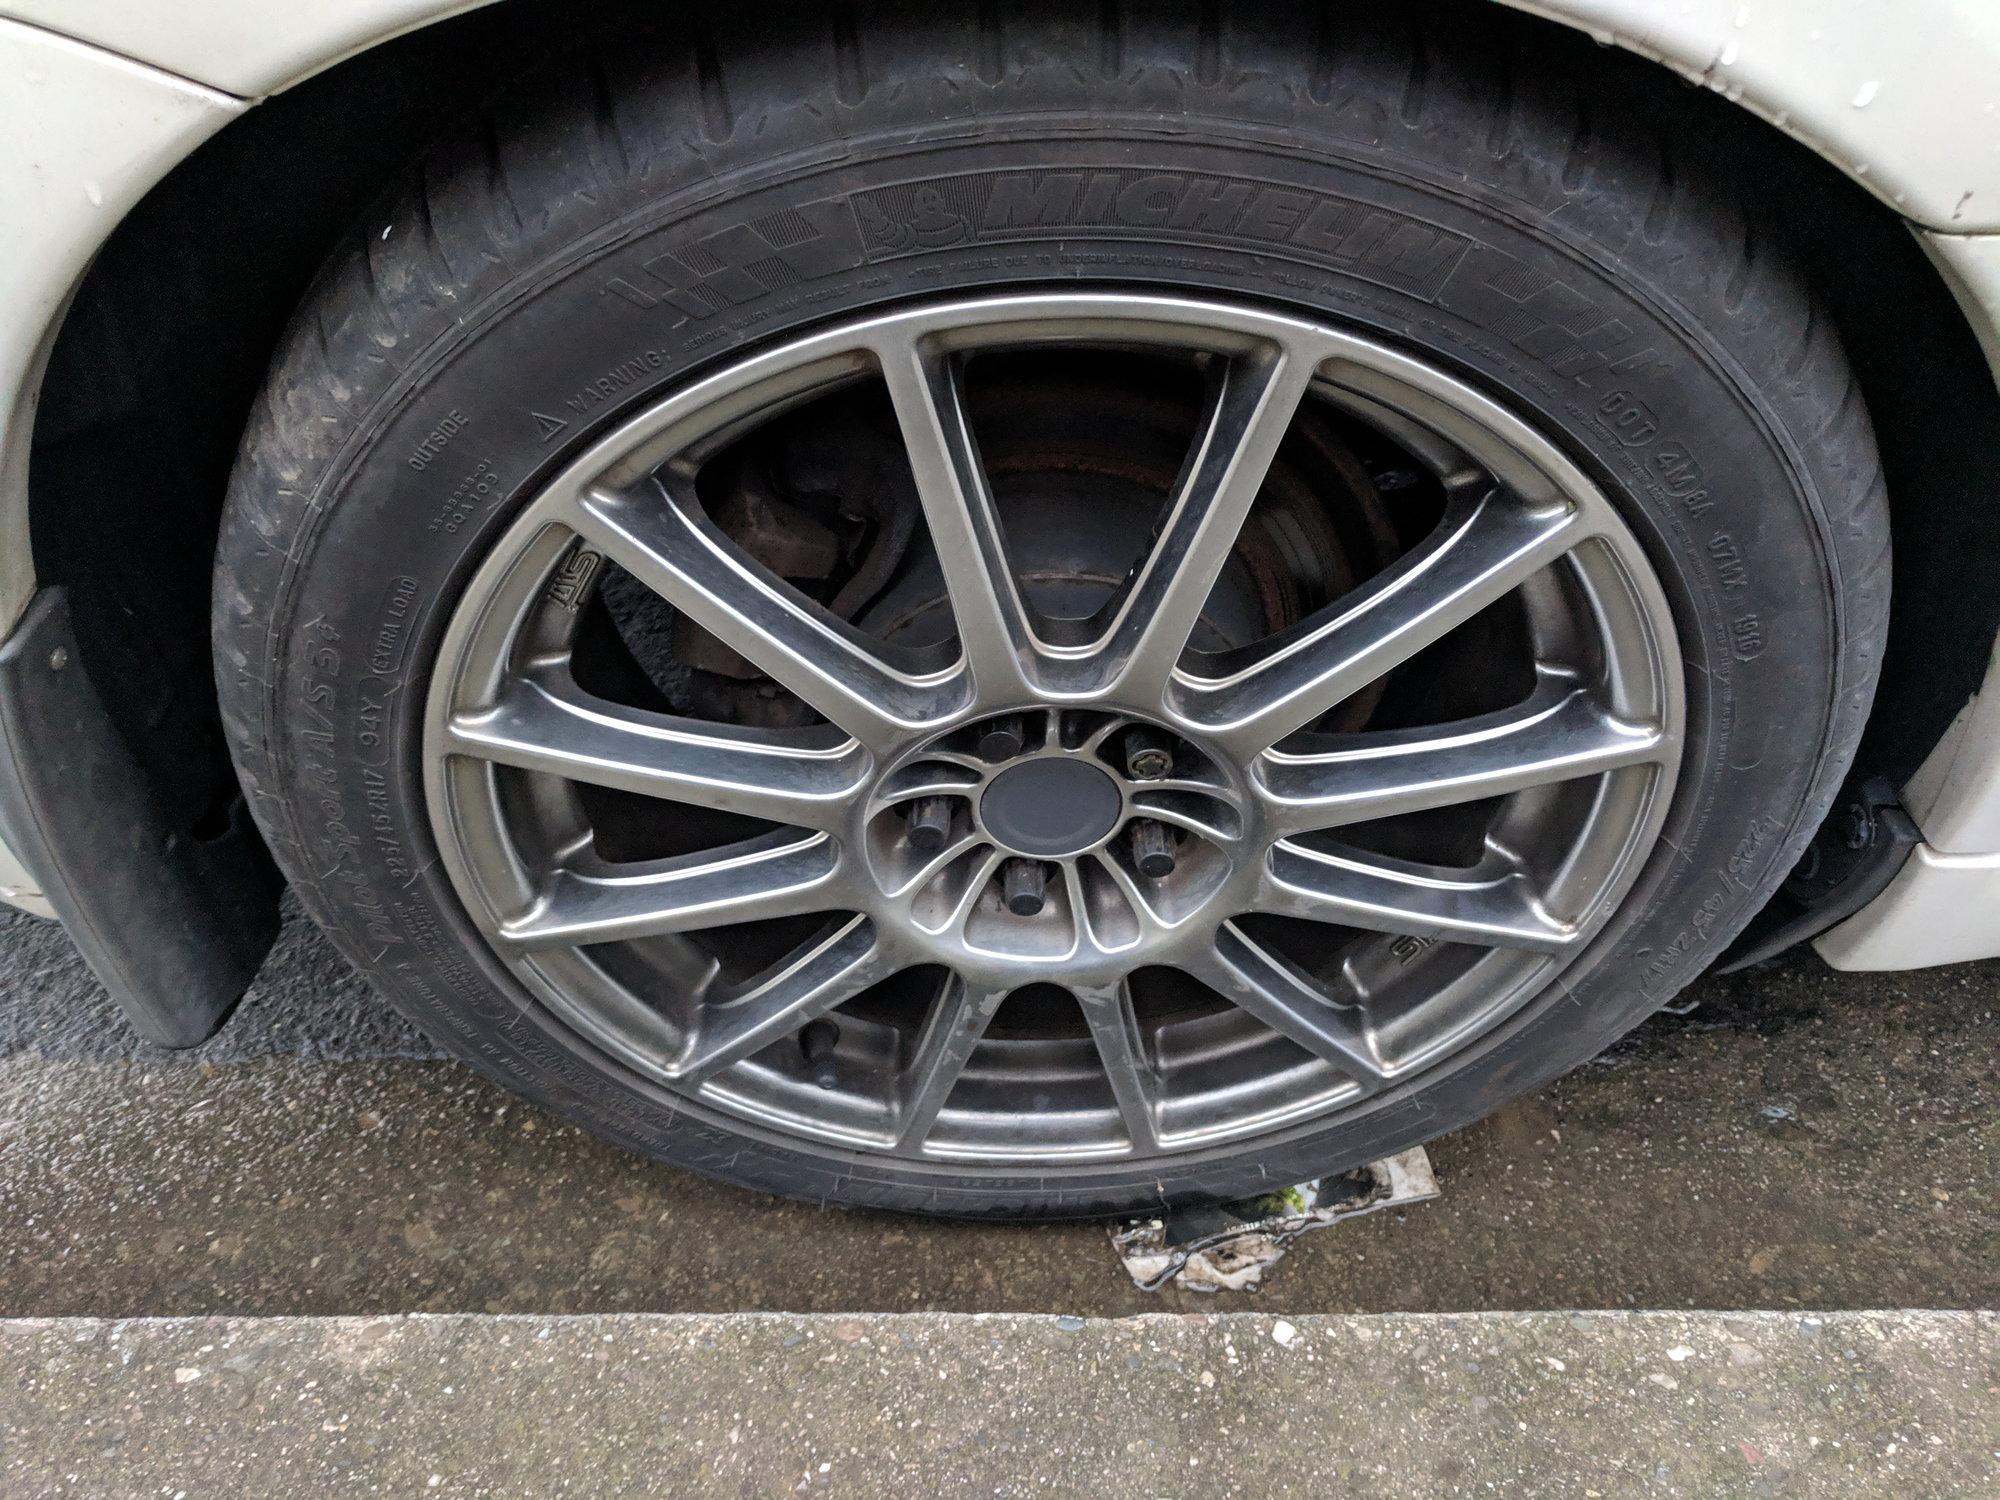 Trade plus cash: 08 FXT Sport wheels w/ 225/45/17 Michelin Pilot